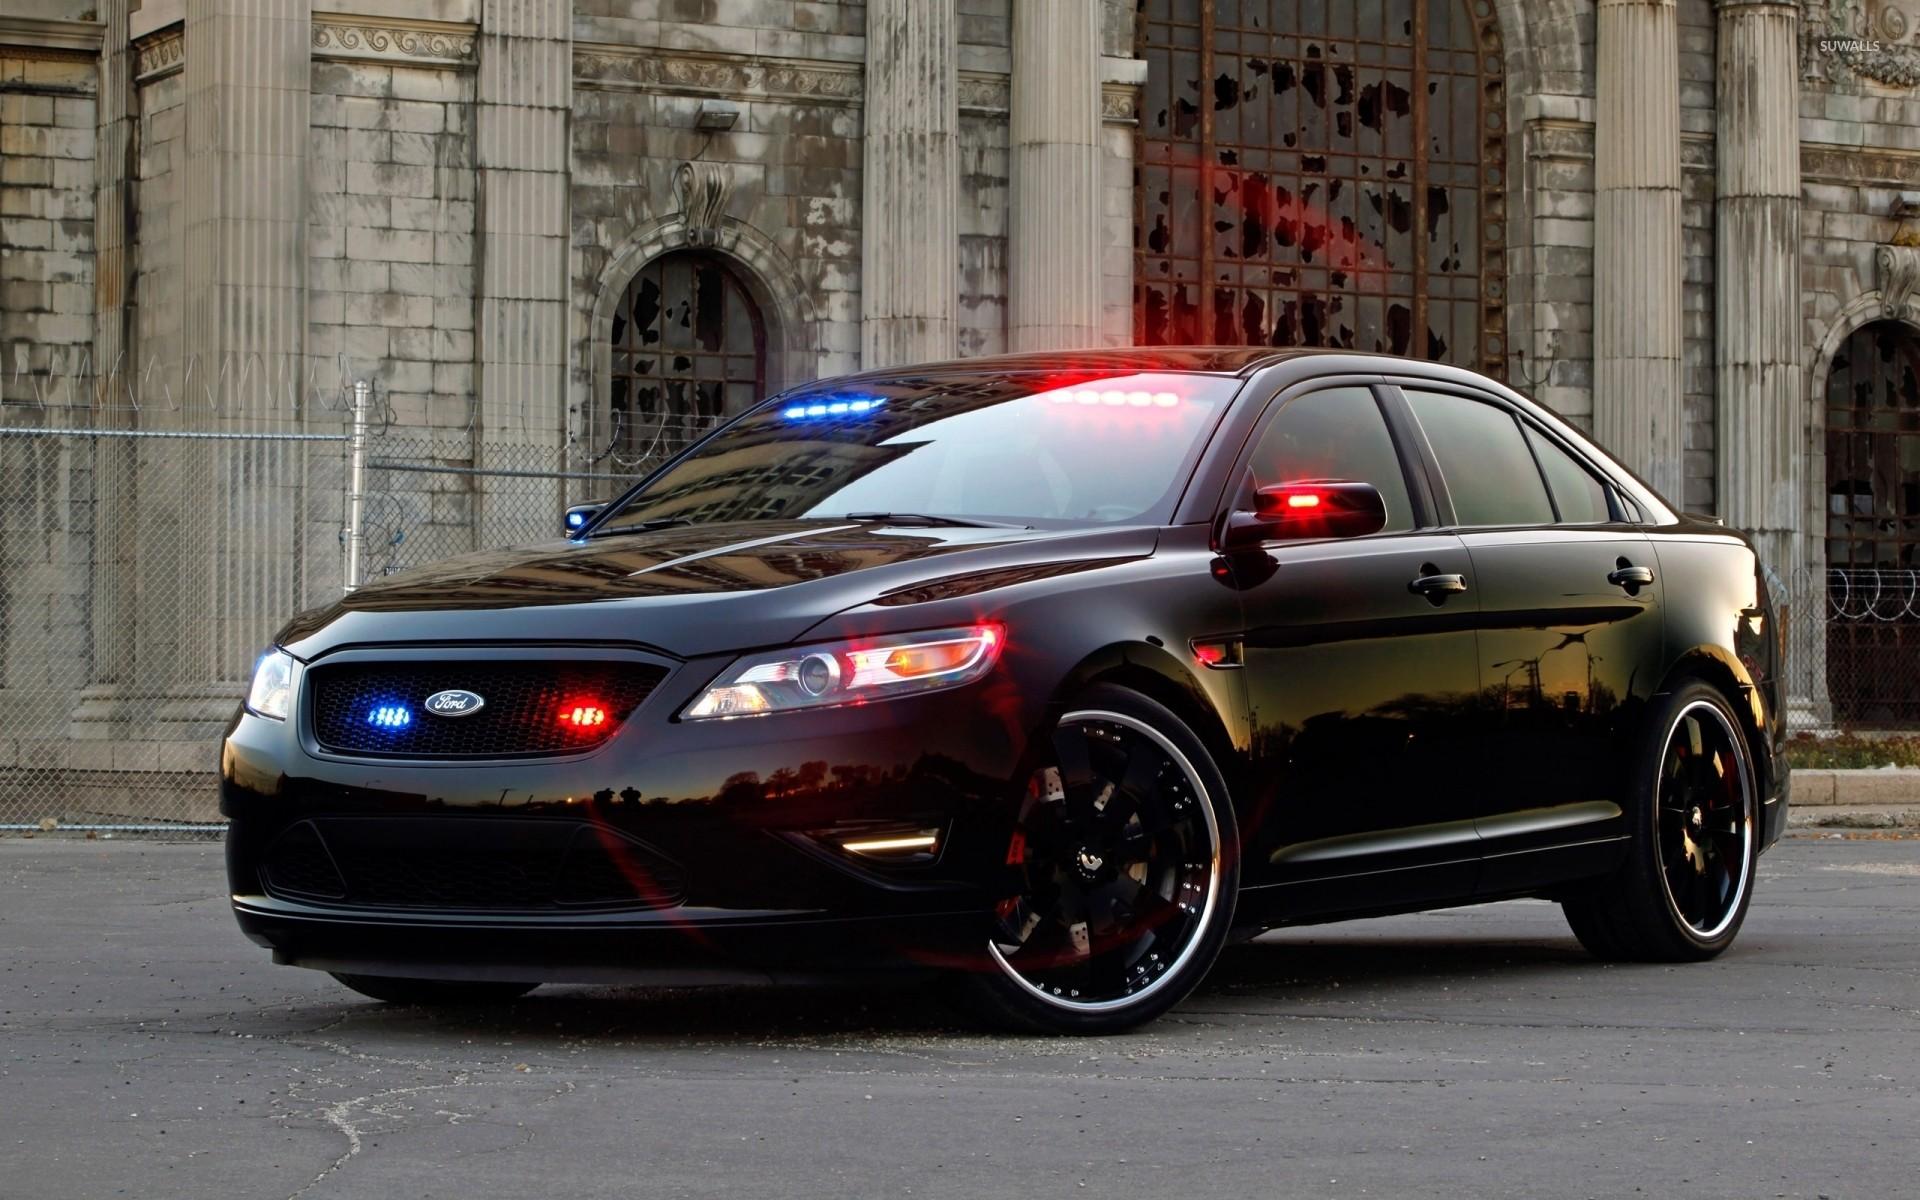 Ford Taurus police car wallpaper jpg